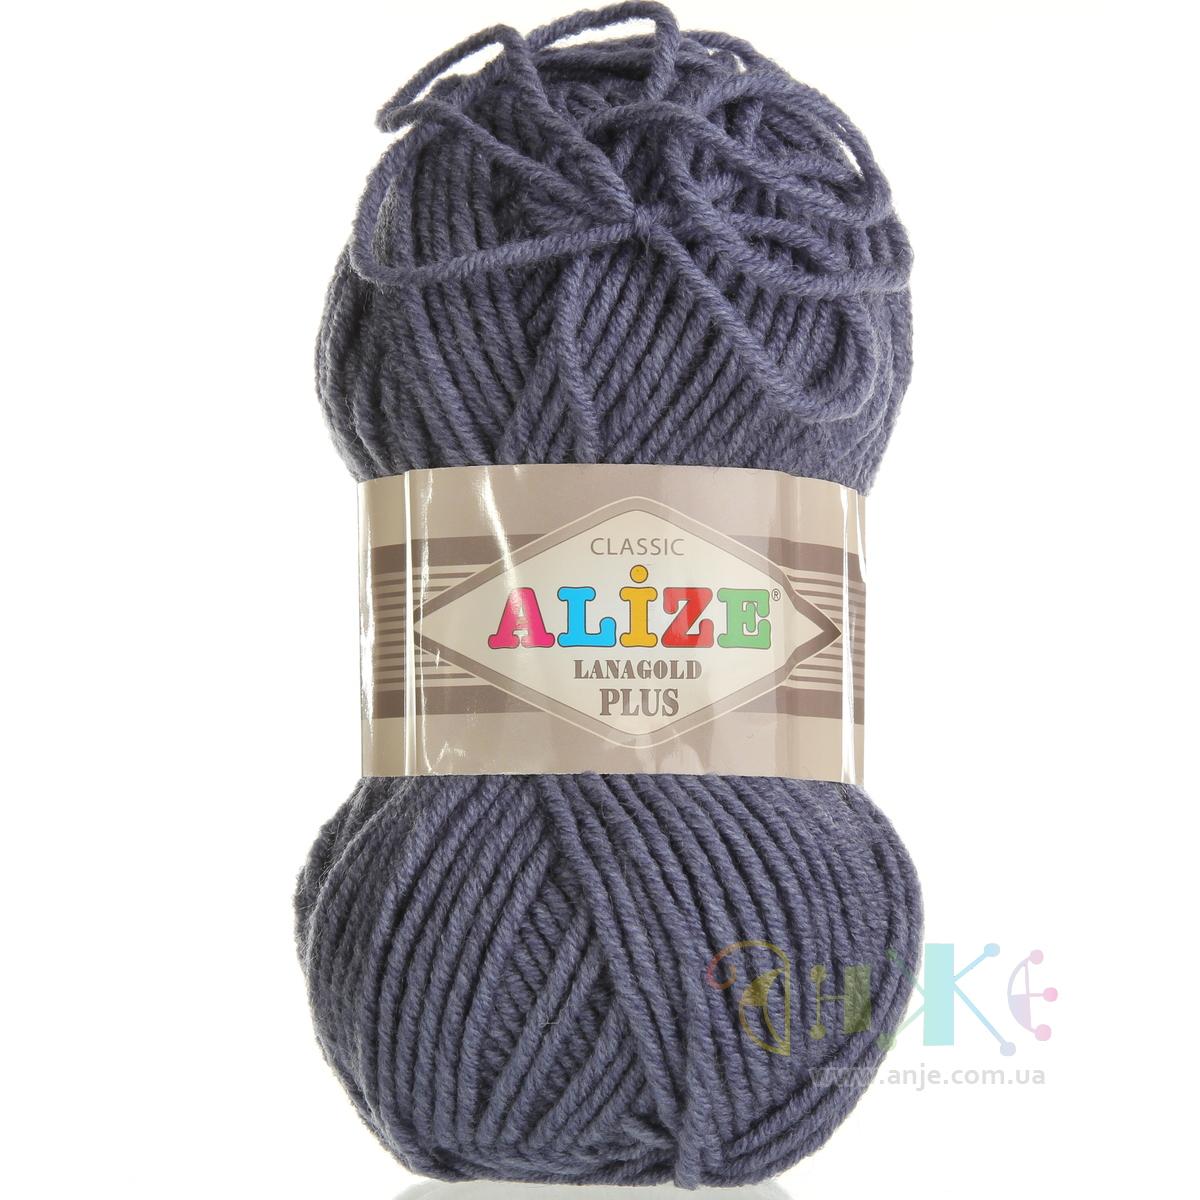 Нитки для вязания лана голд